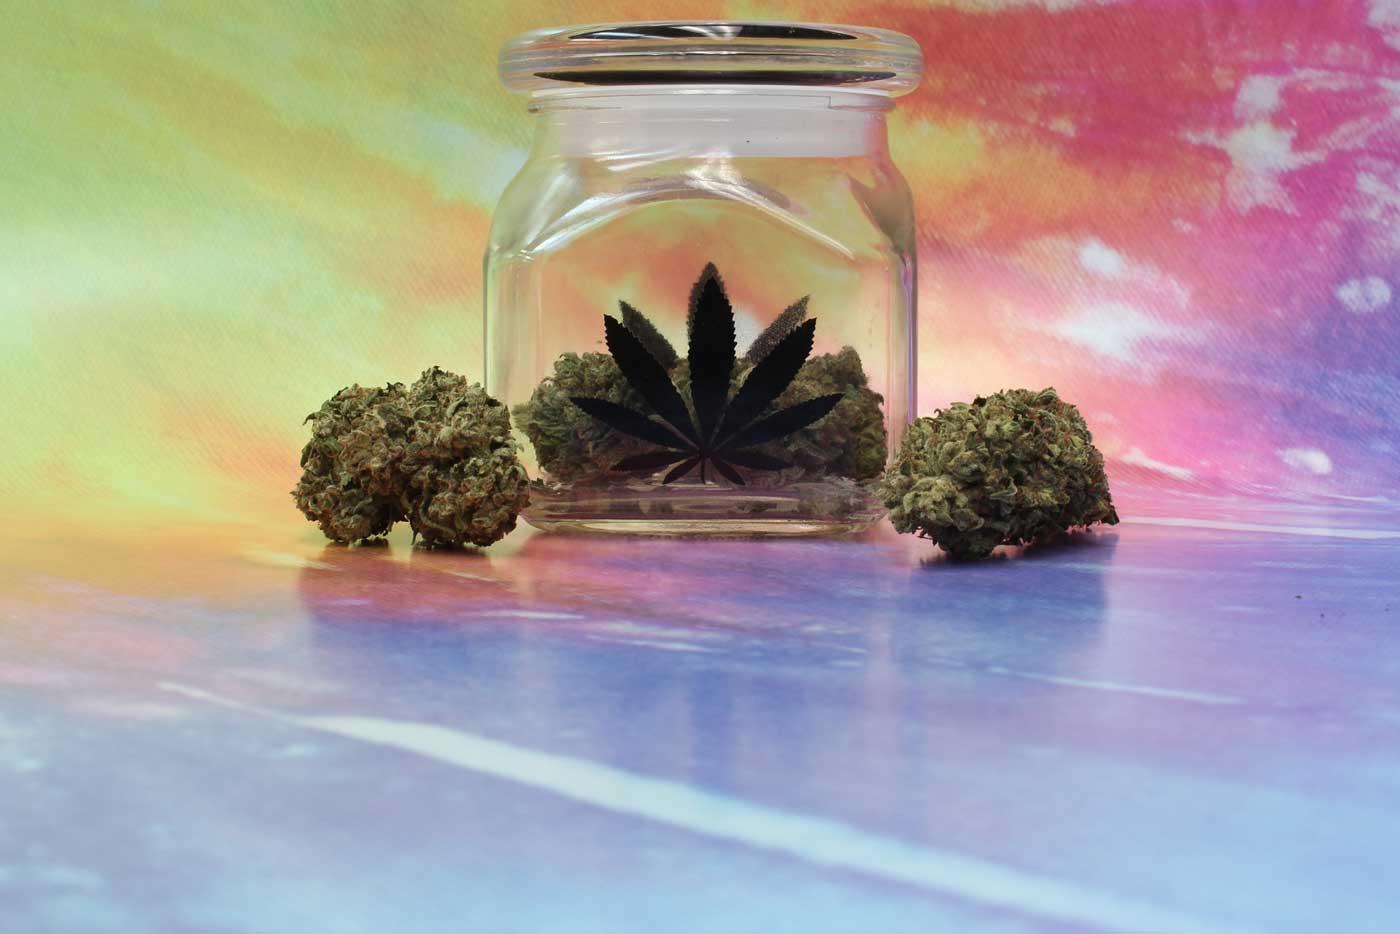 Marihuana medicinal rica en CBD